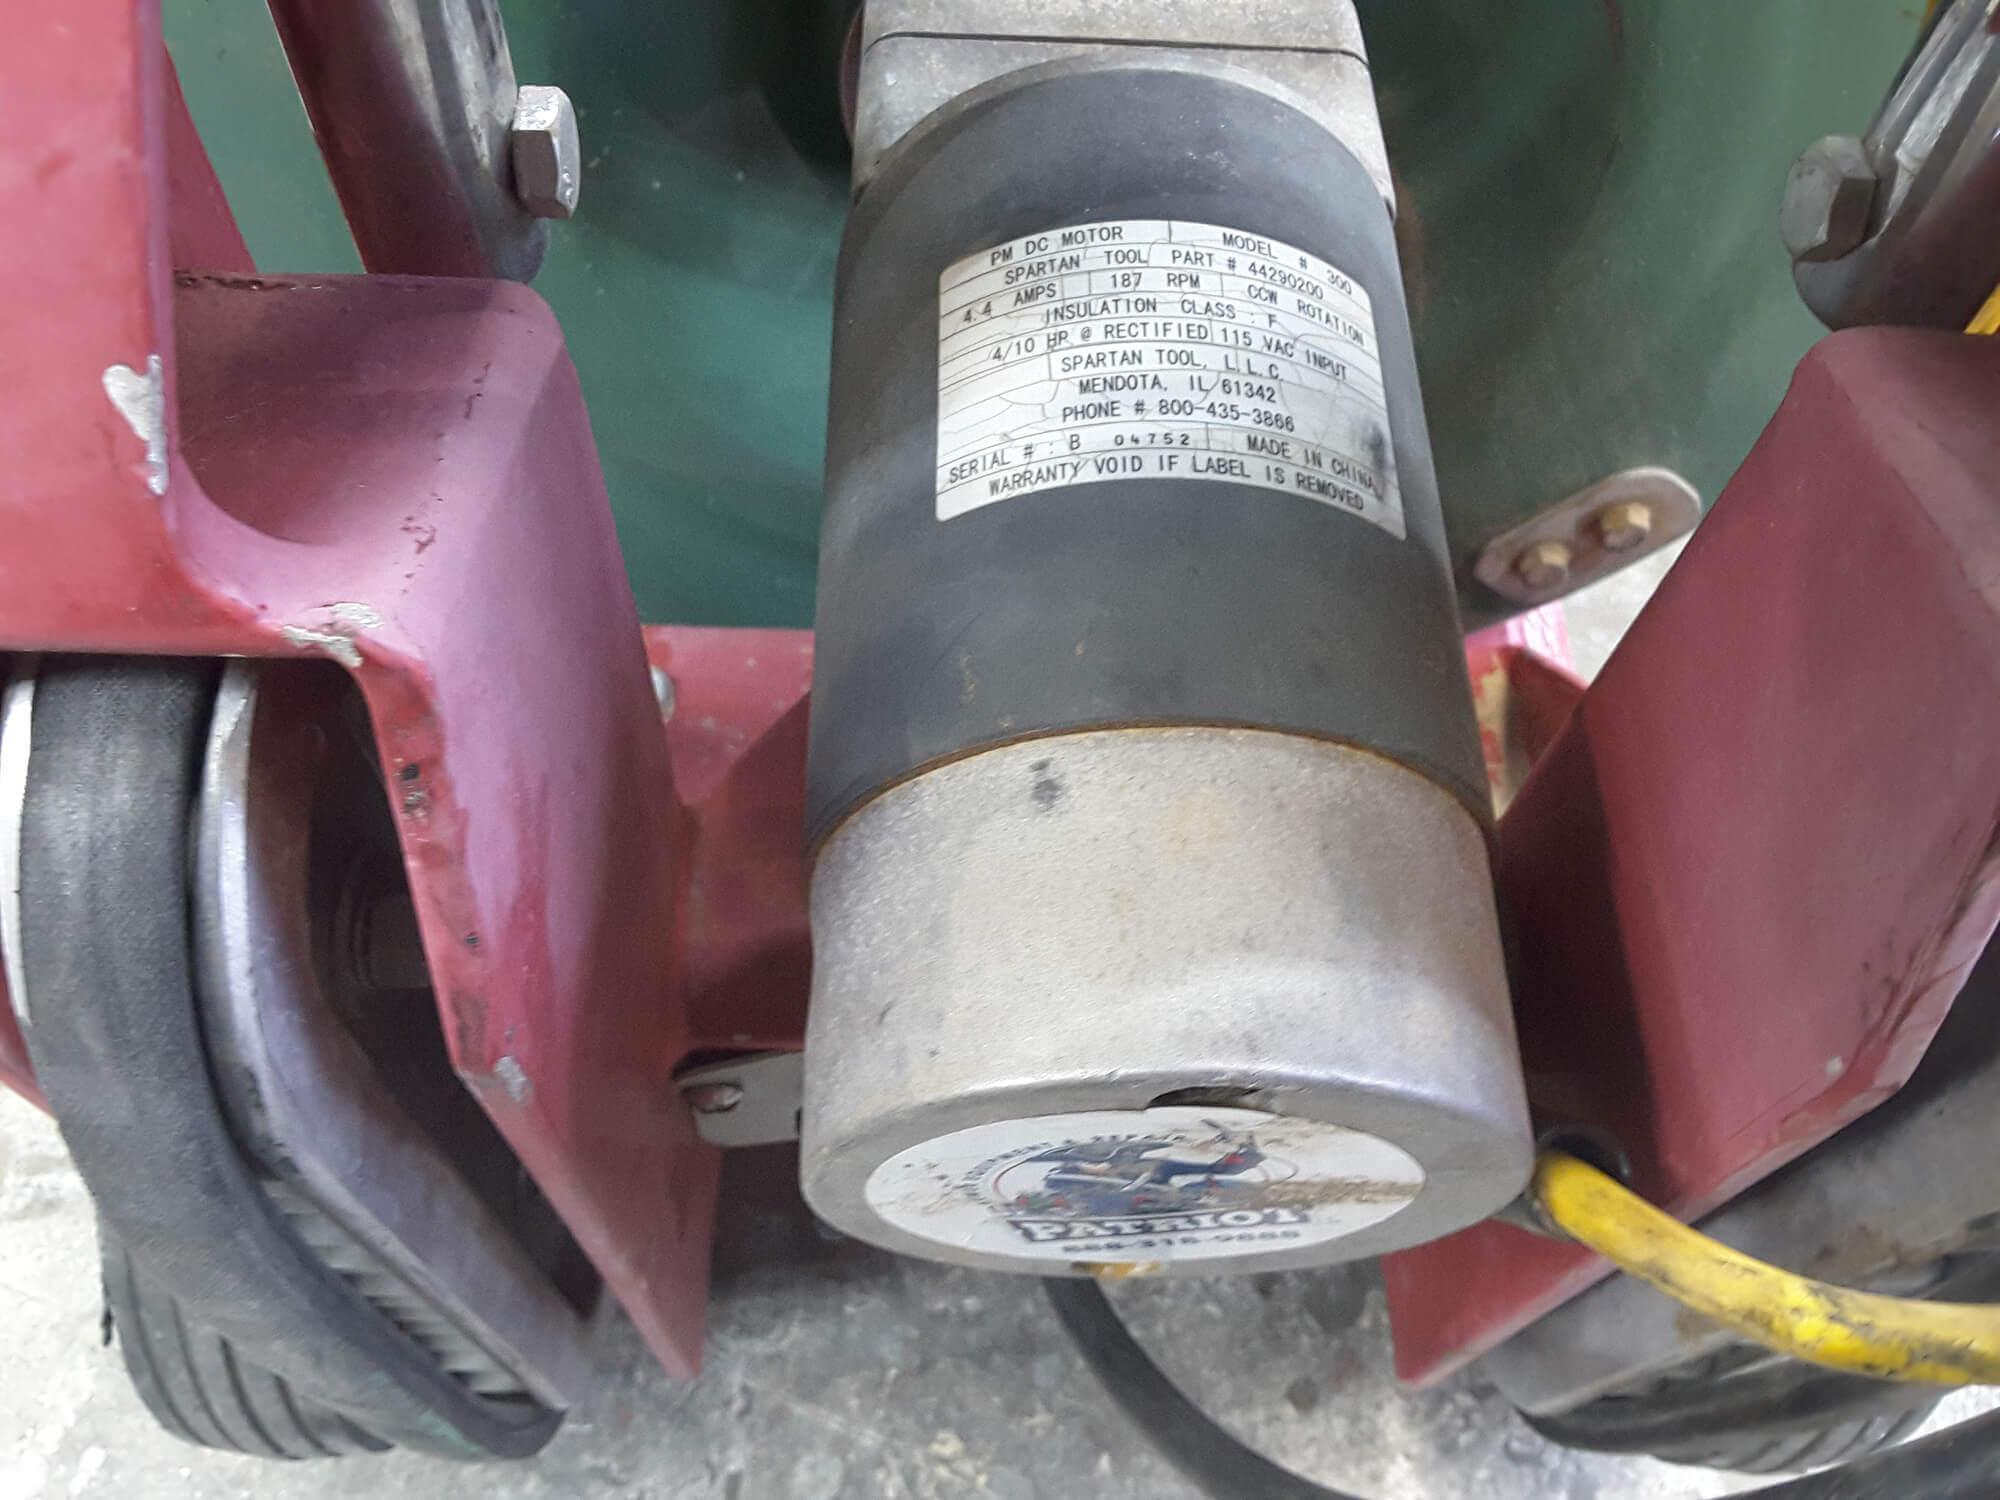 Drain Machine motor replacement - Drain Machine Service & Repair